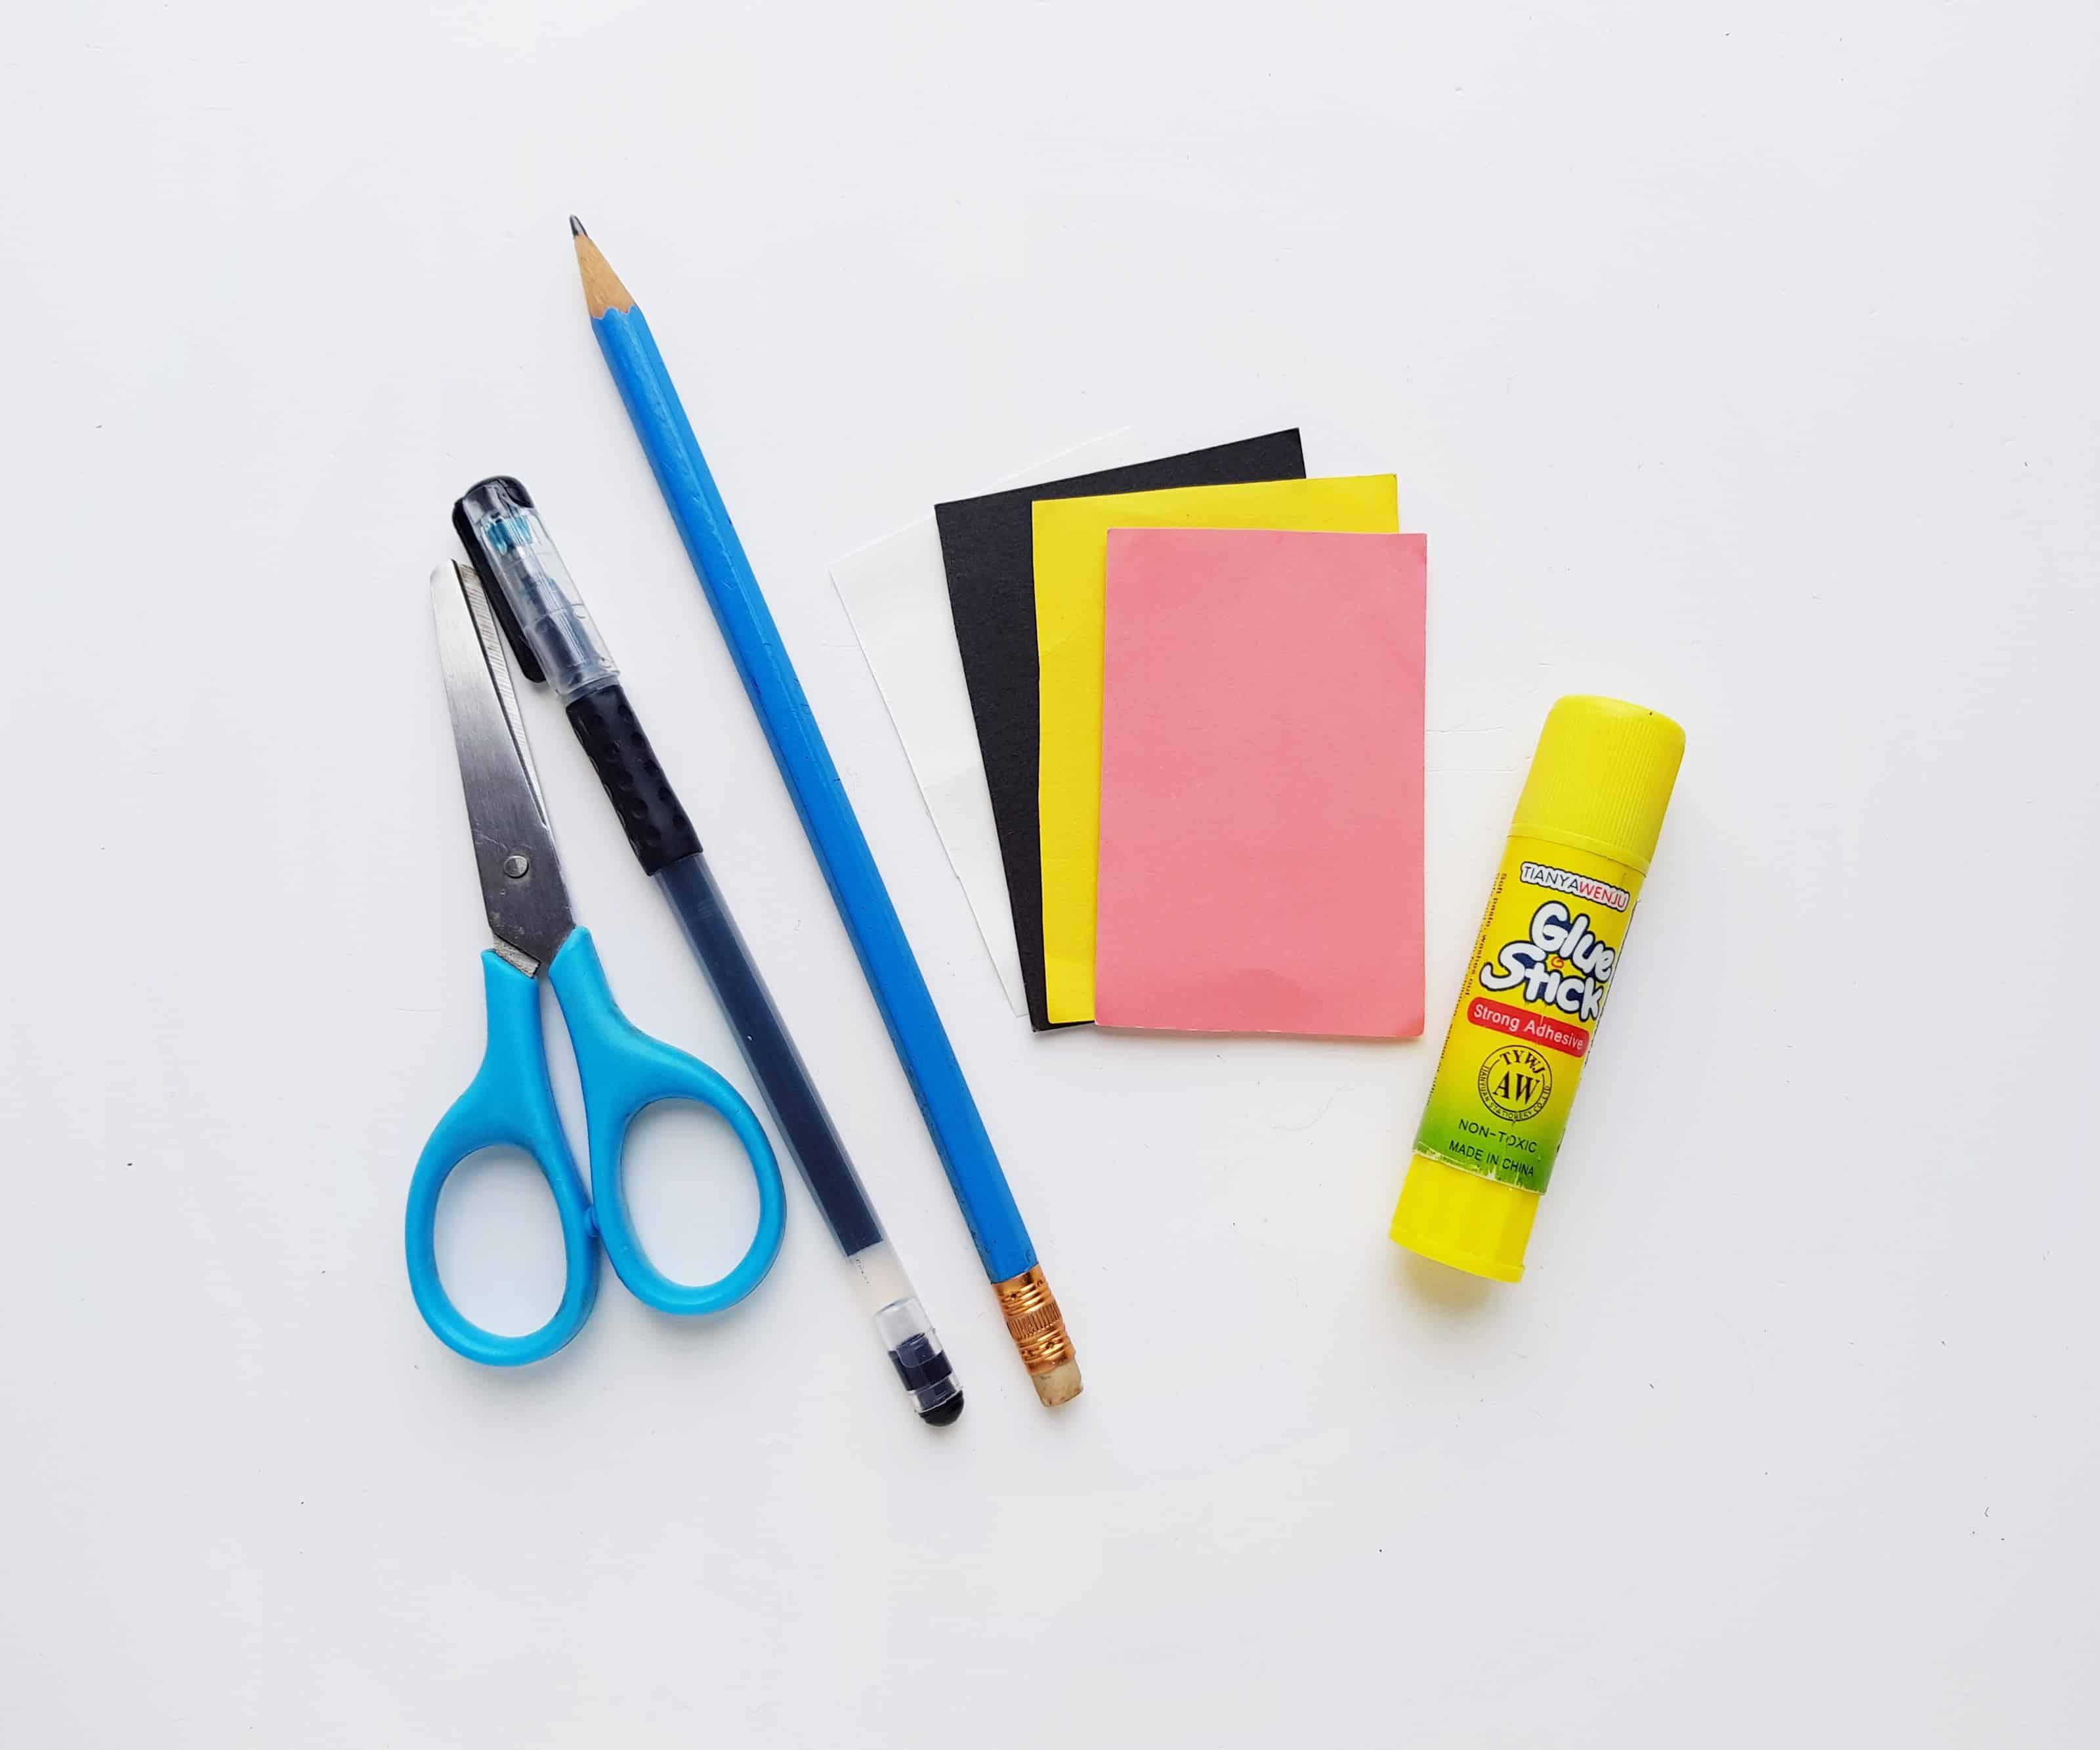 craft supplies, paper, scissors, glue stick, gel pen, pencil